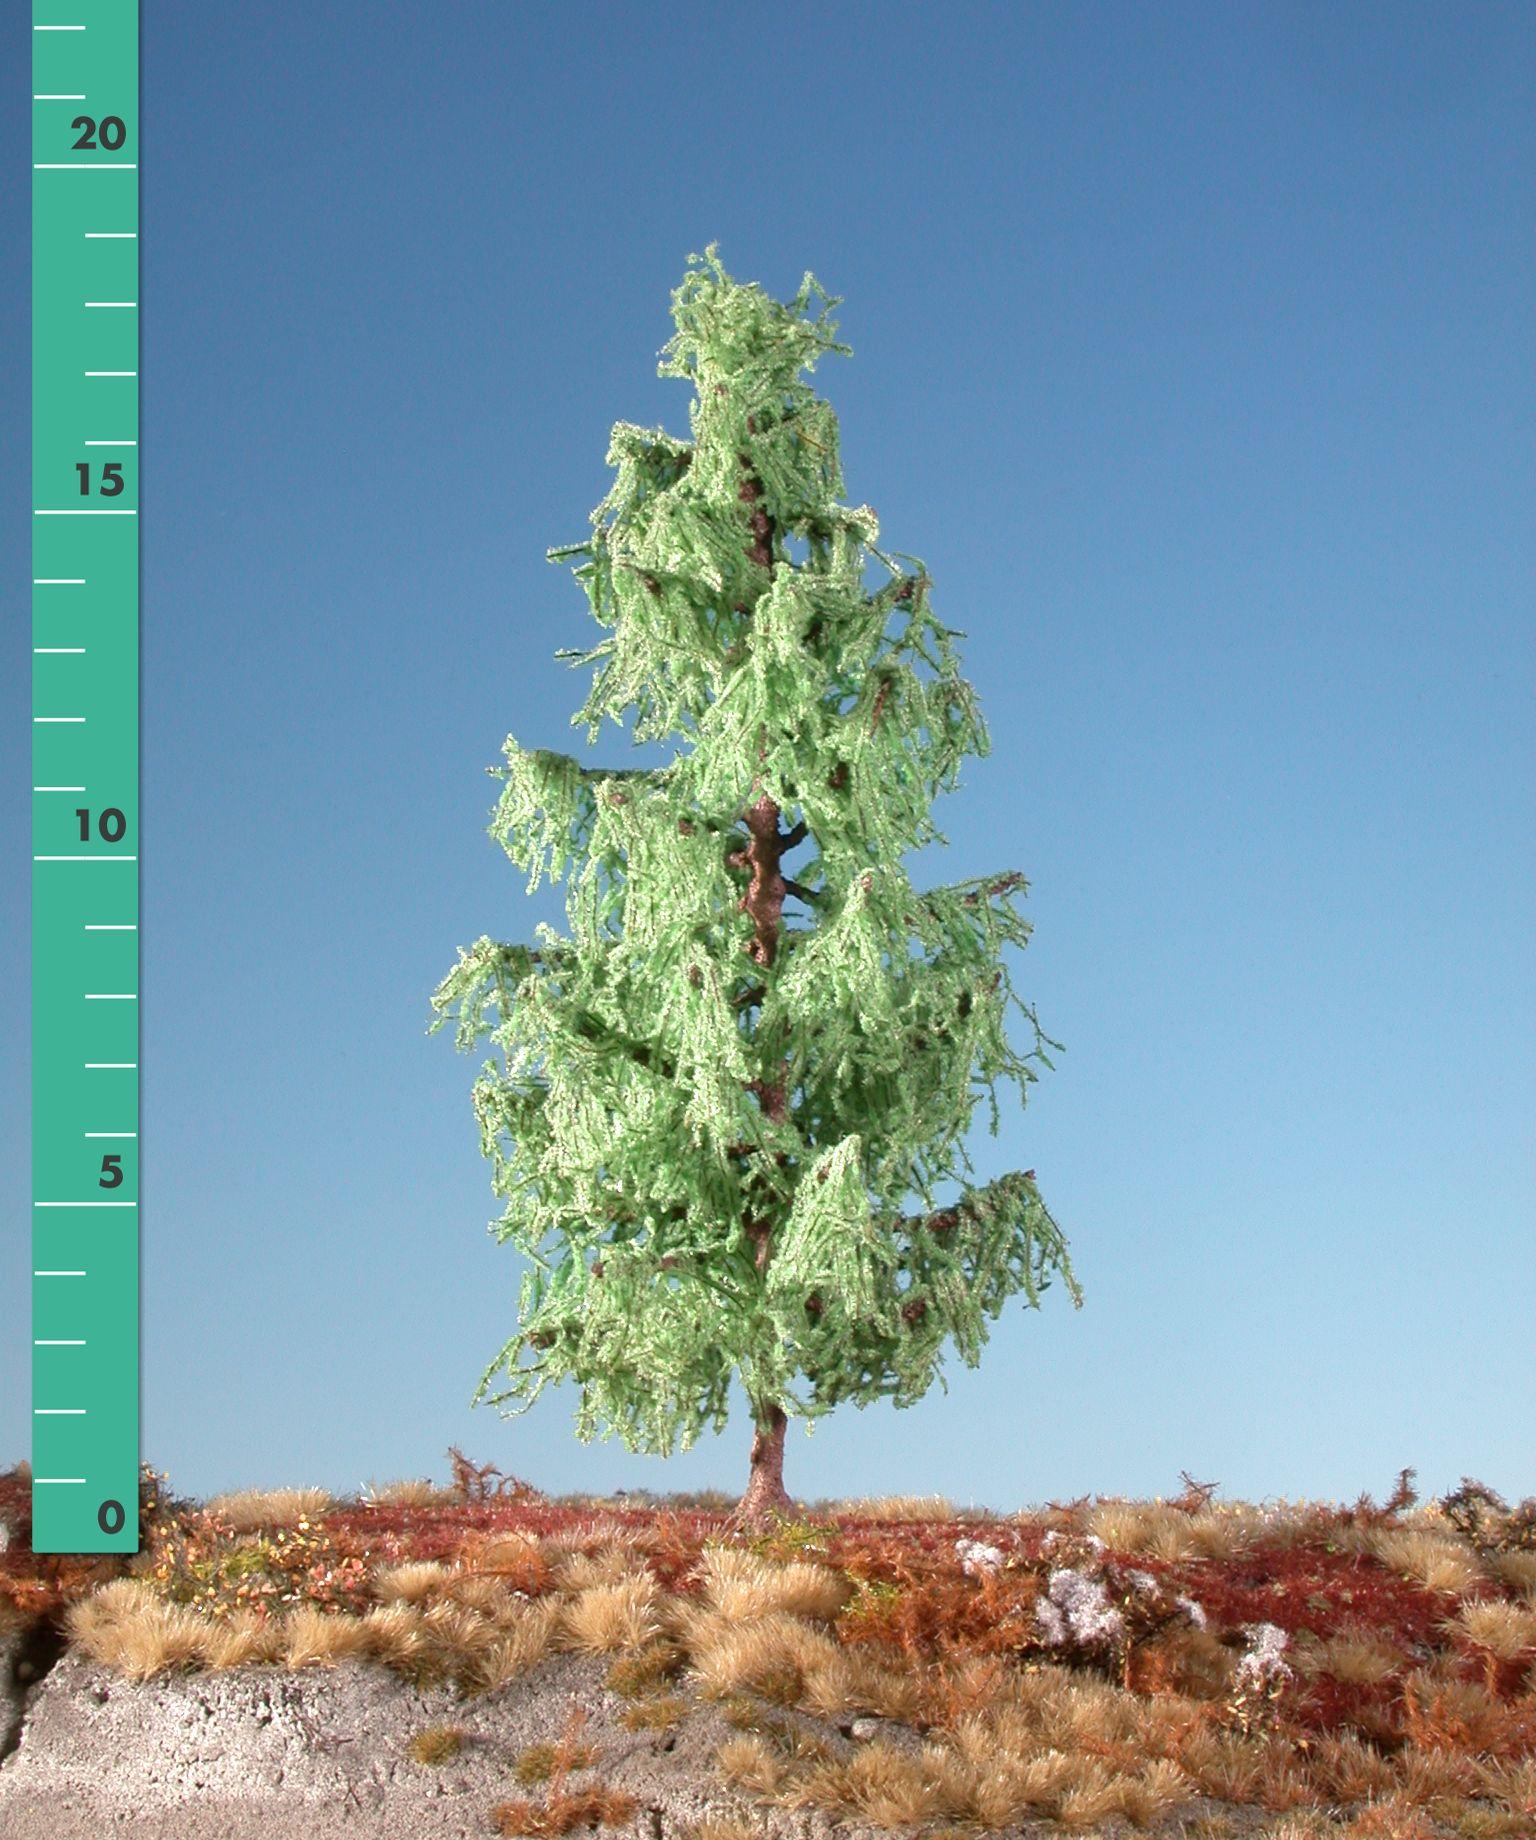 l rche 1 45 fr hling modellbaum miniaturmodelle b ume pflanzen belaubung. Black Bedroom Furniture Sets. Home Design Ideas